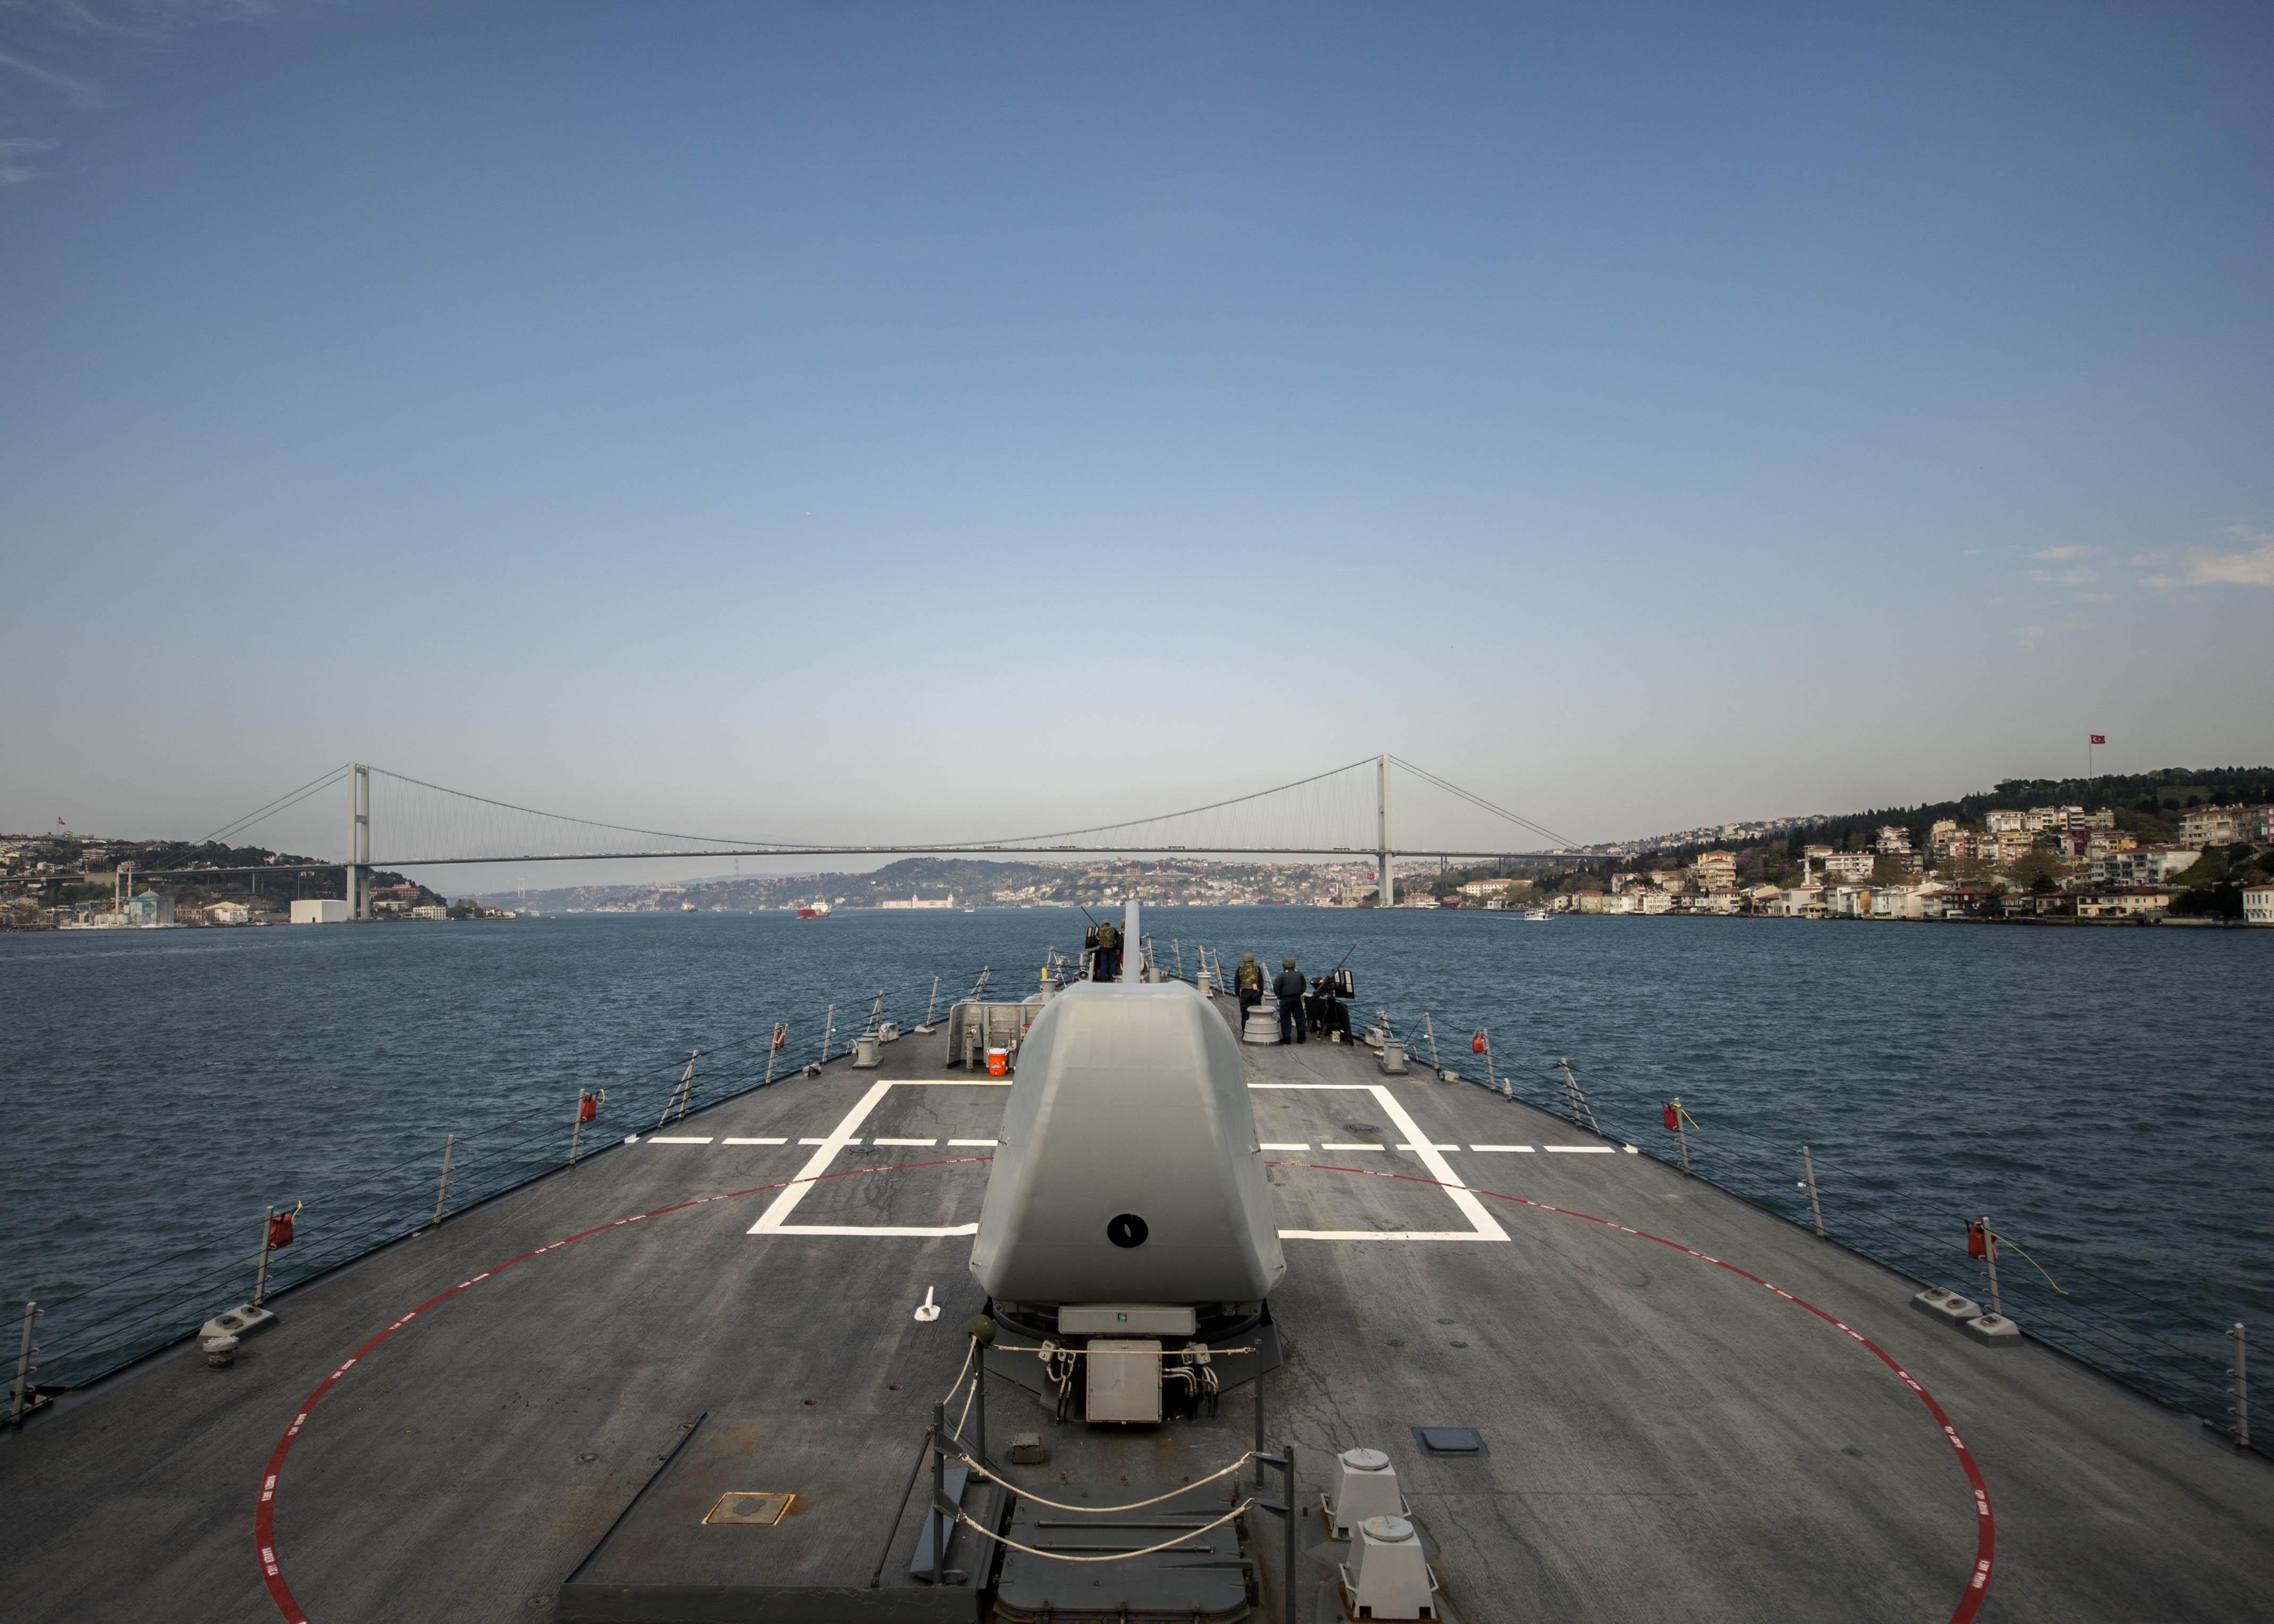 USS DONALD COOK DDG-75 Istanbul/Bosporus am 10.04.2014 Bild: U.S. Navy